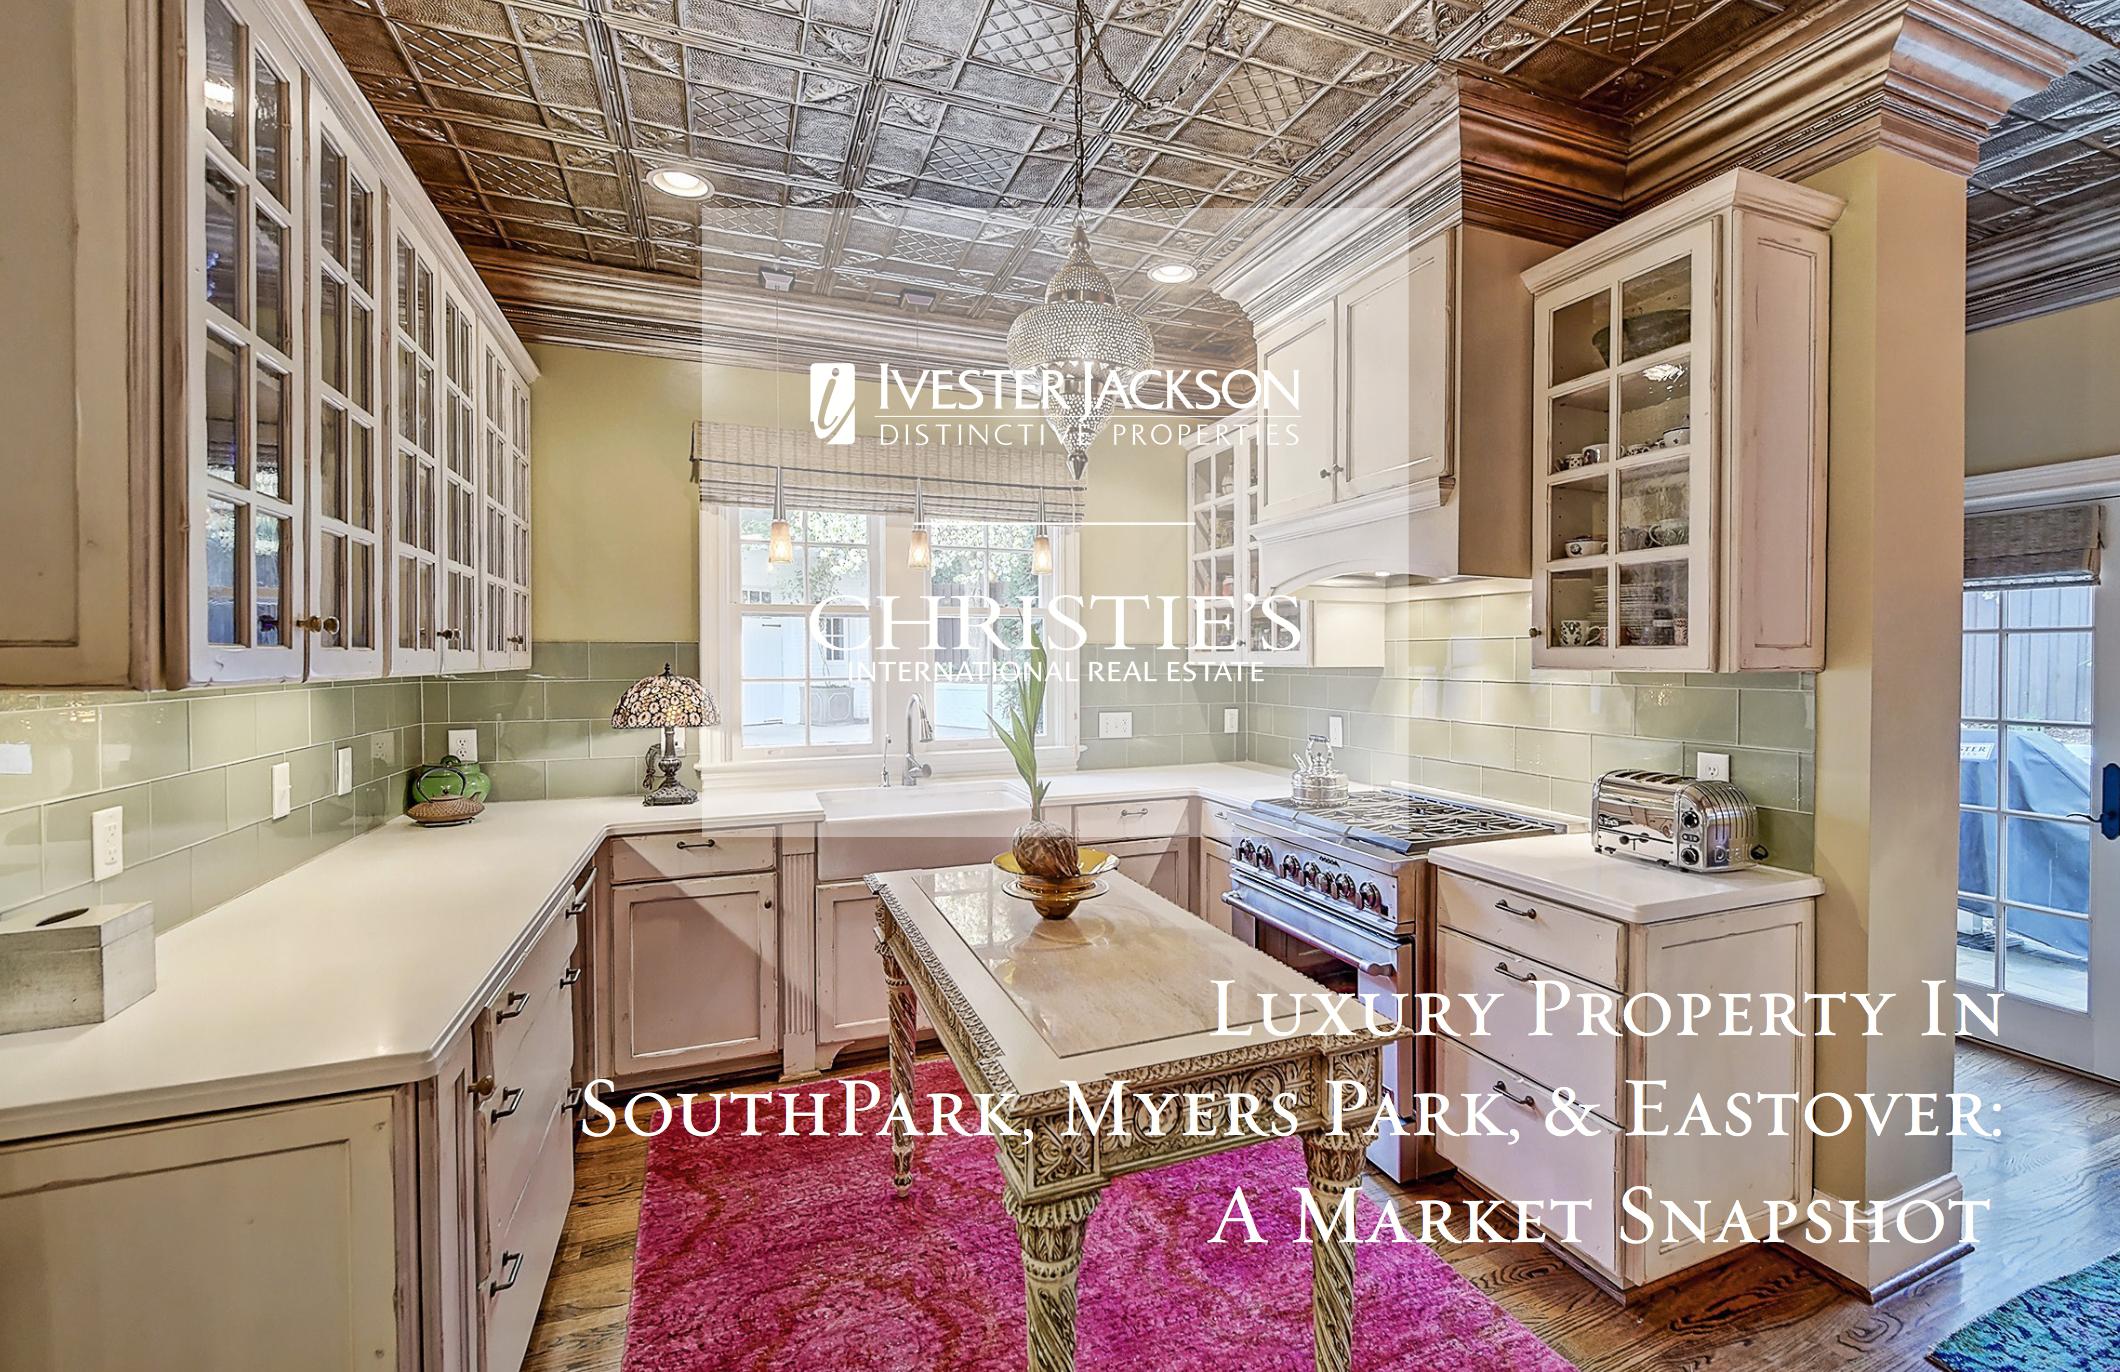 Charlotte Market Snapshot: Luxury Property in SouthPark, Myers Park & Eastover